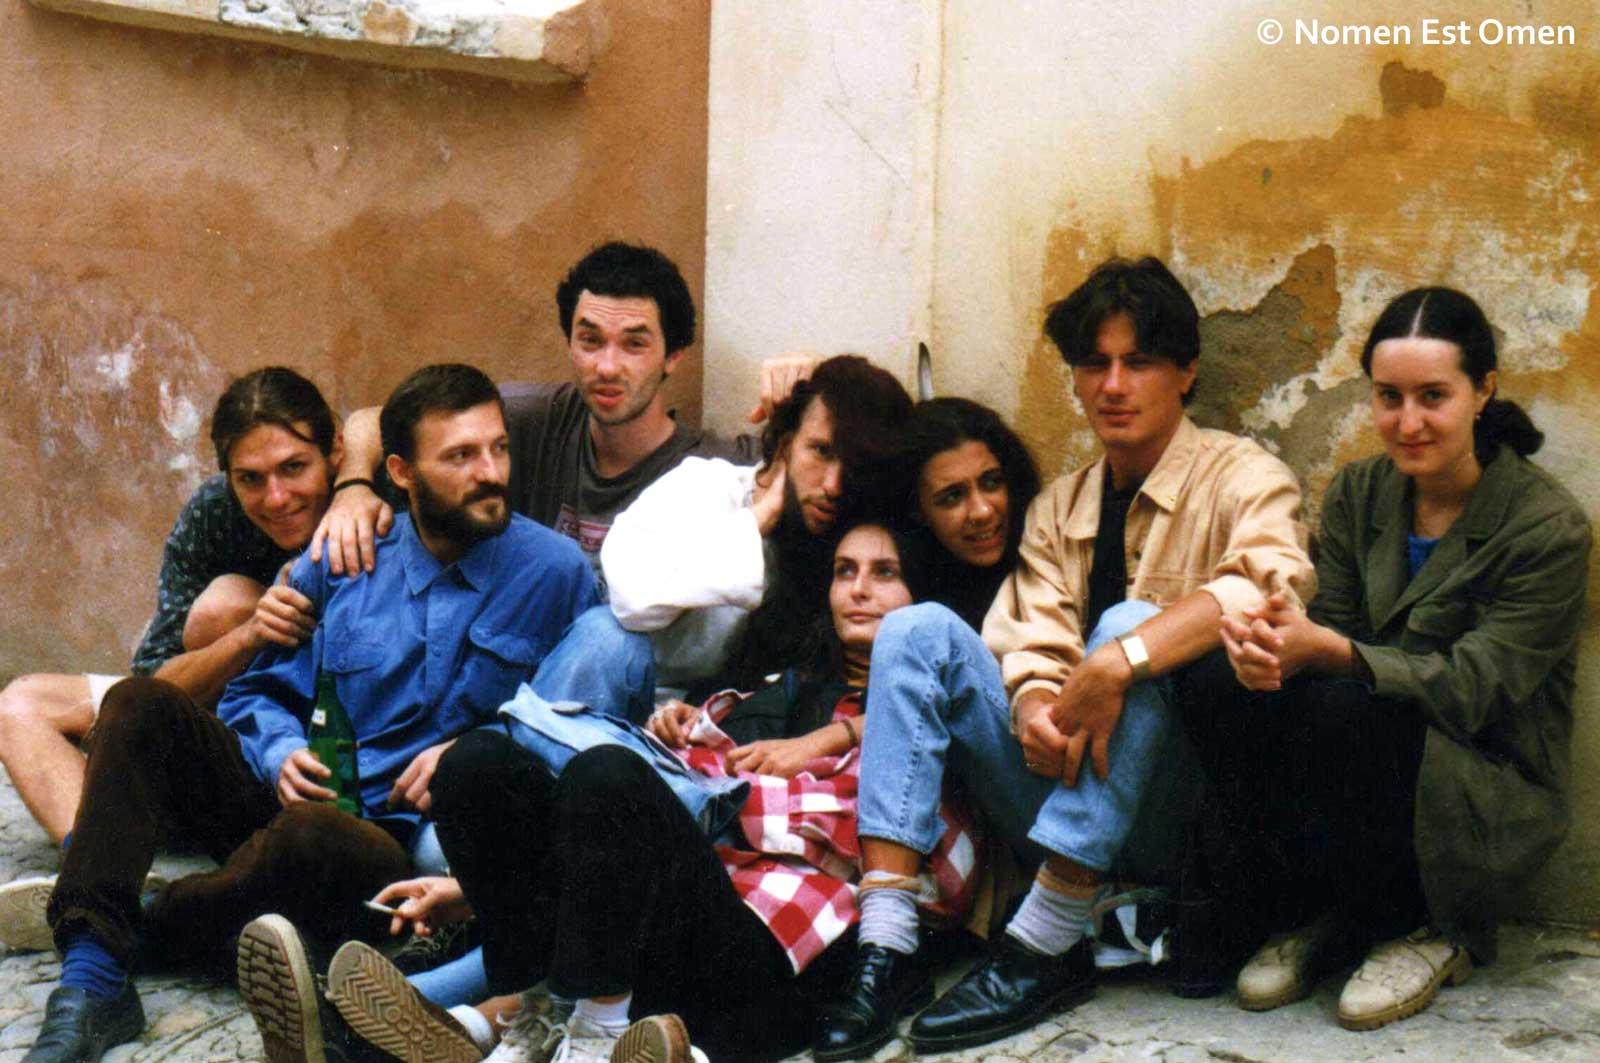 Nomen Est Omen la Sighisoara Medievala 1996